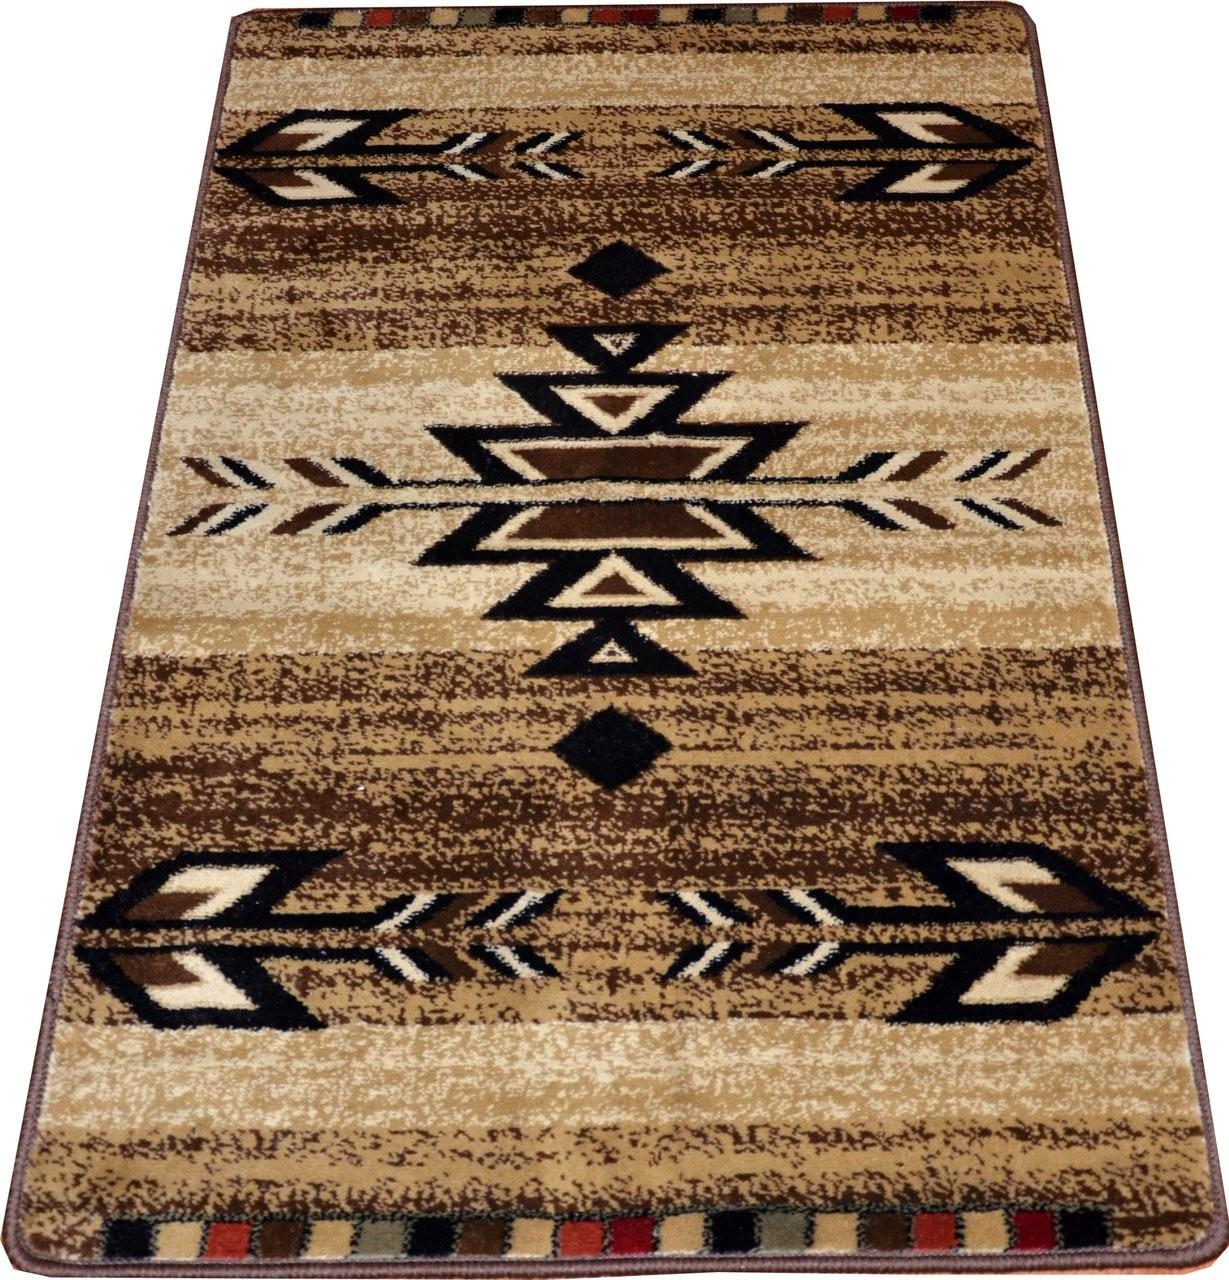 Dean Santa Fe Beige 31 W Southwestern Lodge Cabin Carpet Rug | Hallway Carpet Runners Sold By The Foot | Rug Depot | Hall | Woven Rug | Wool Rug | Fleur De Lis